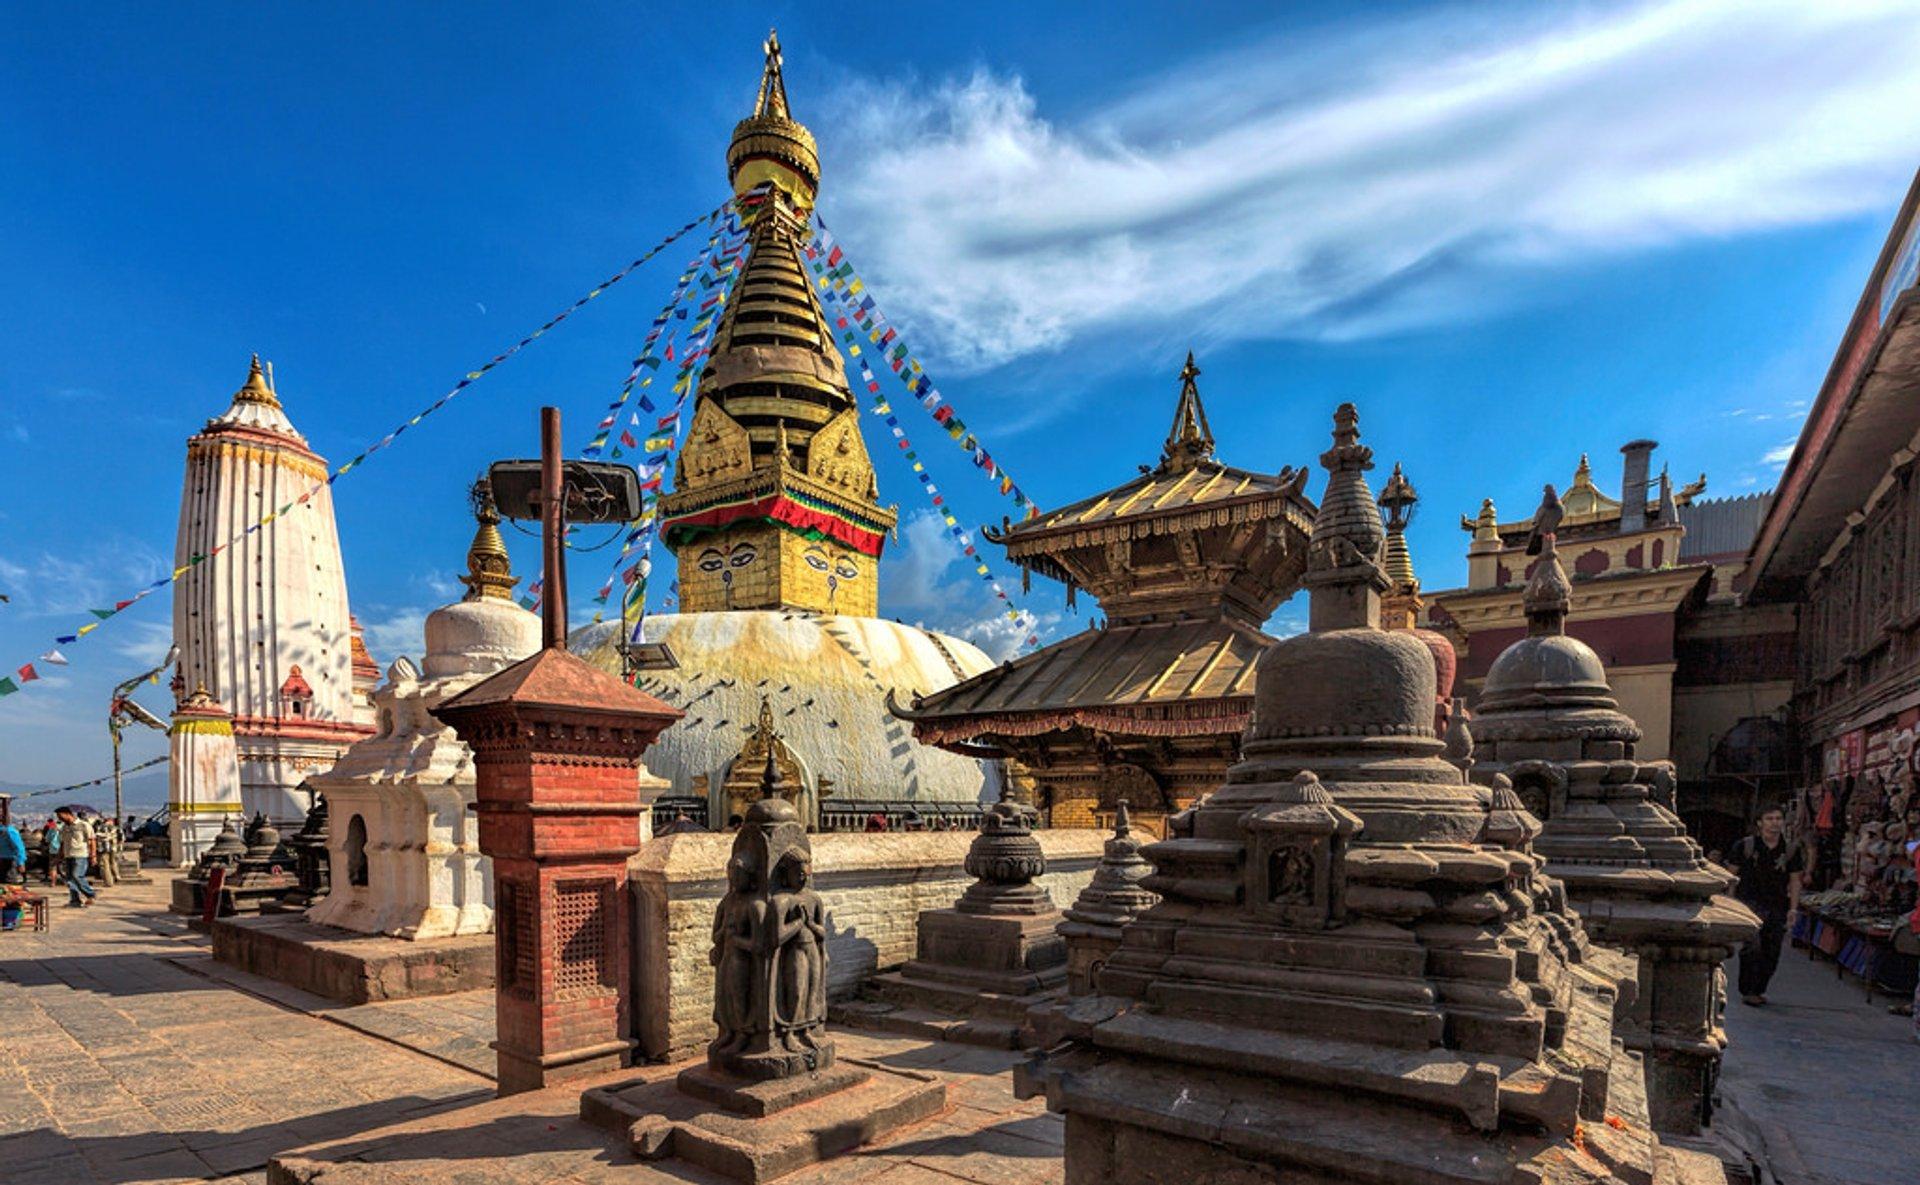 Swayambhunath (Monkey Temple) in Kathmandu - Best Season 2019